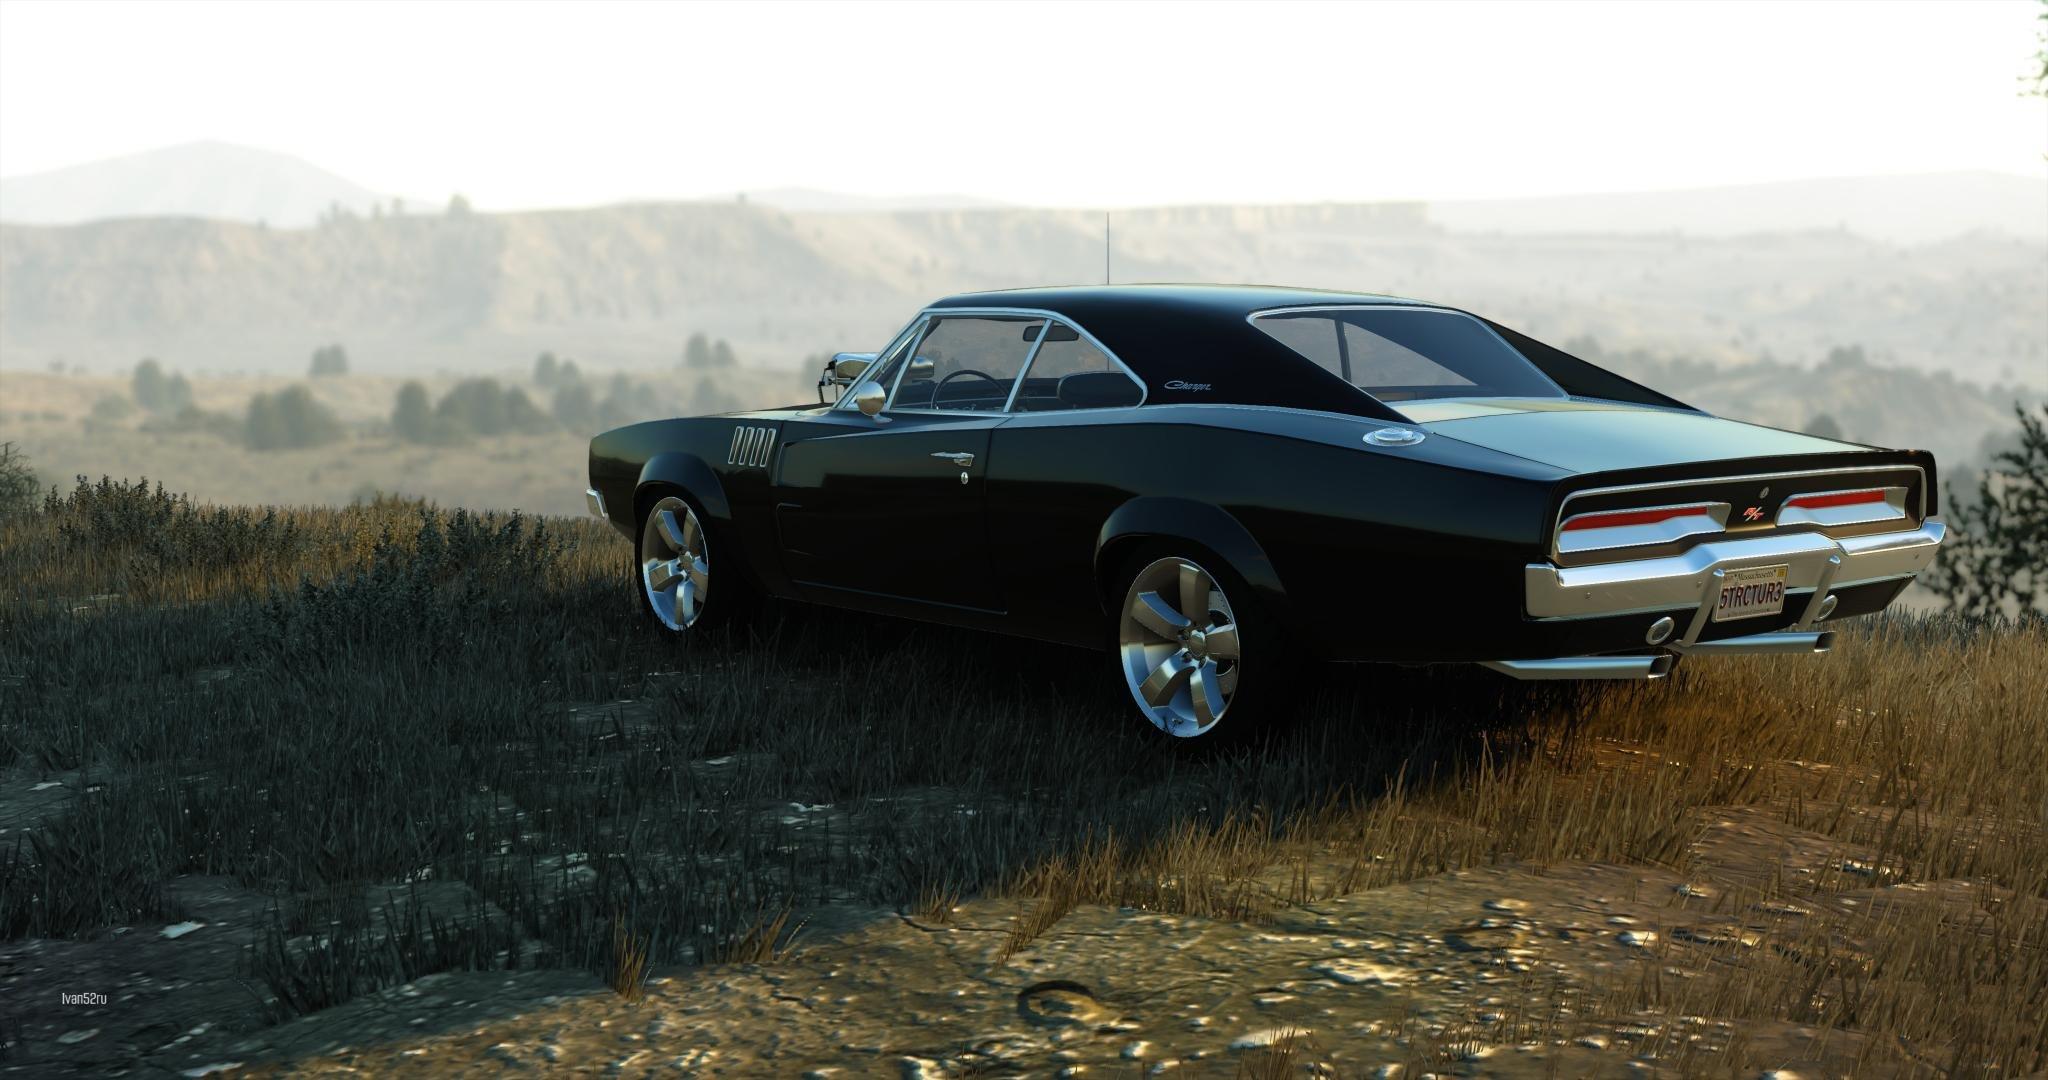 Free Download Grand Theft Auto V Gta 5 Wallpaper Id195048